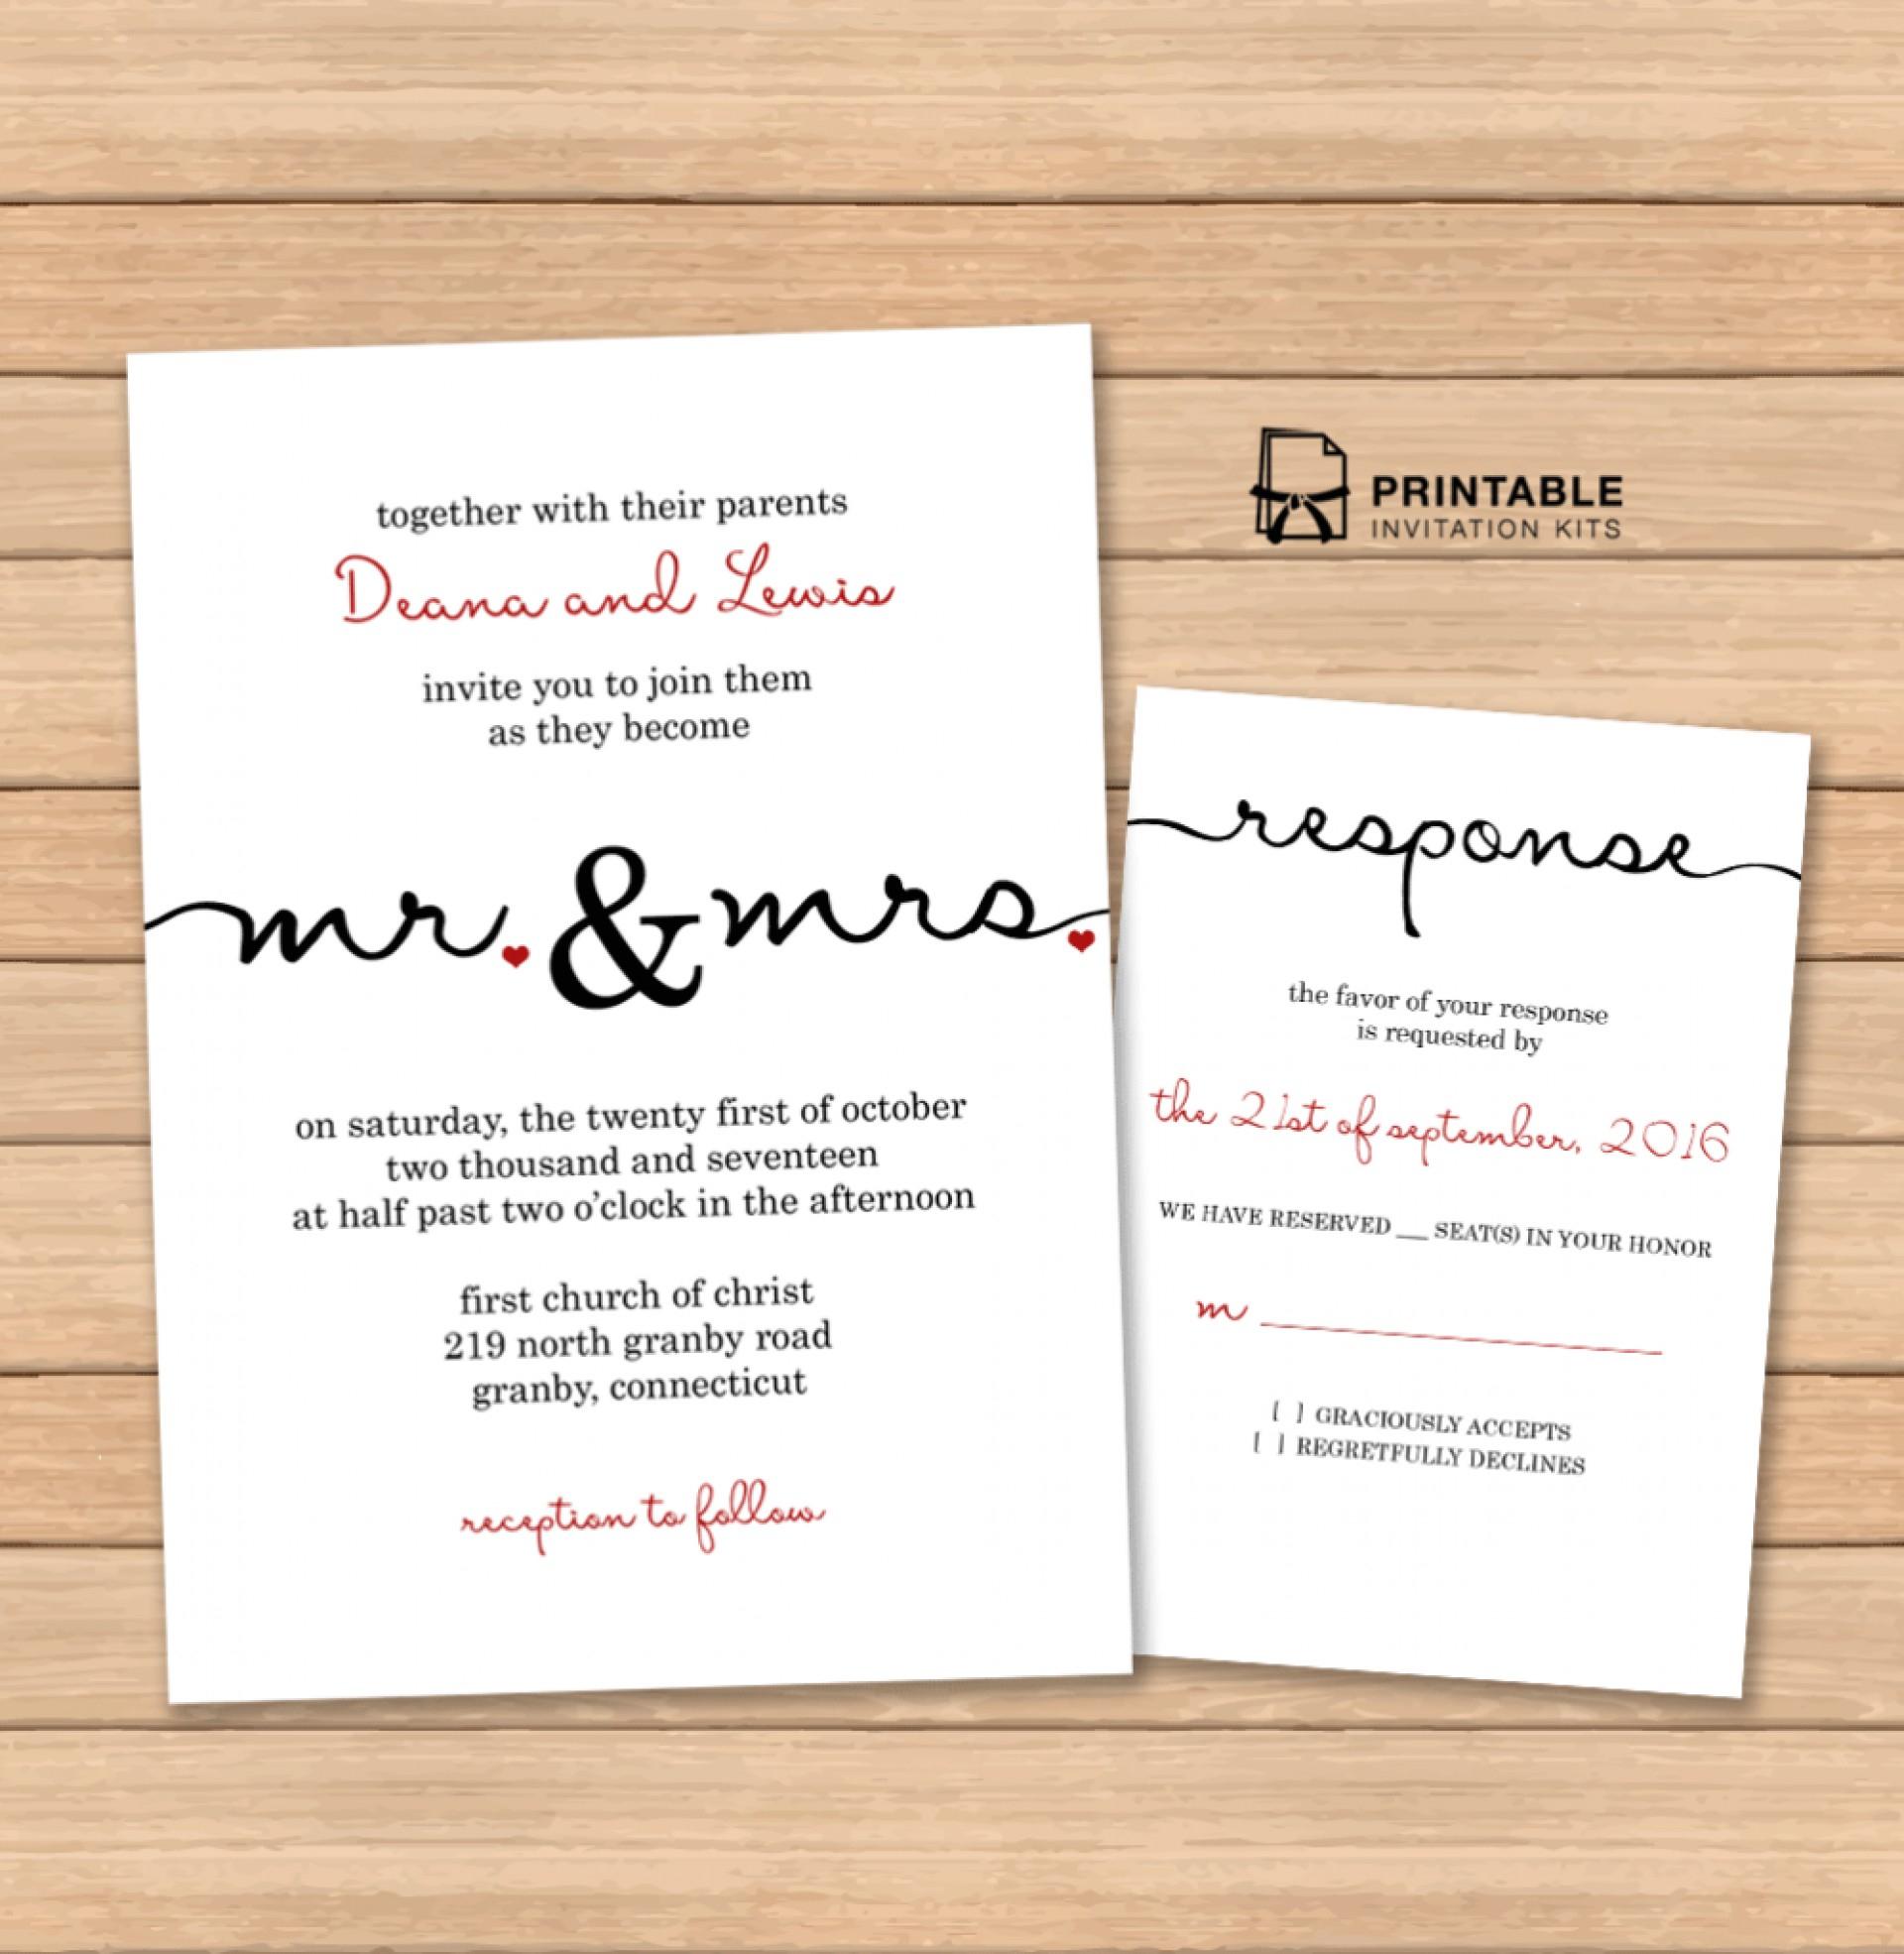 019 Car Insurance Cards Template Inspirational Wedding Registry Card - Free Printable Registry Cards